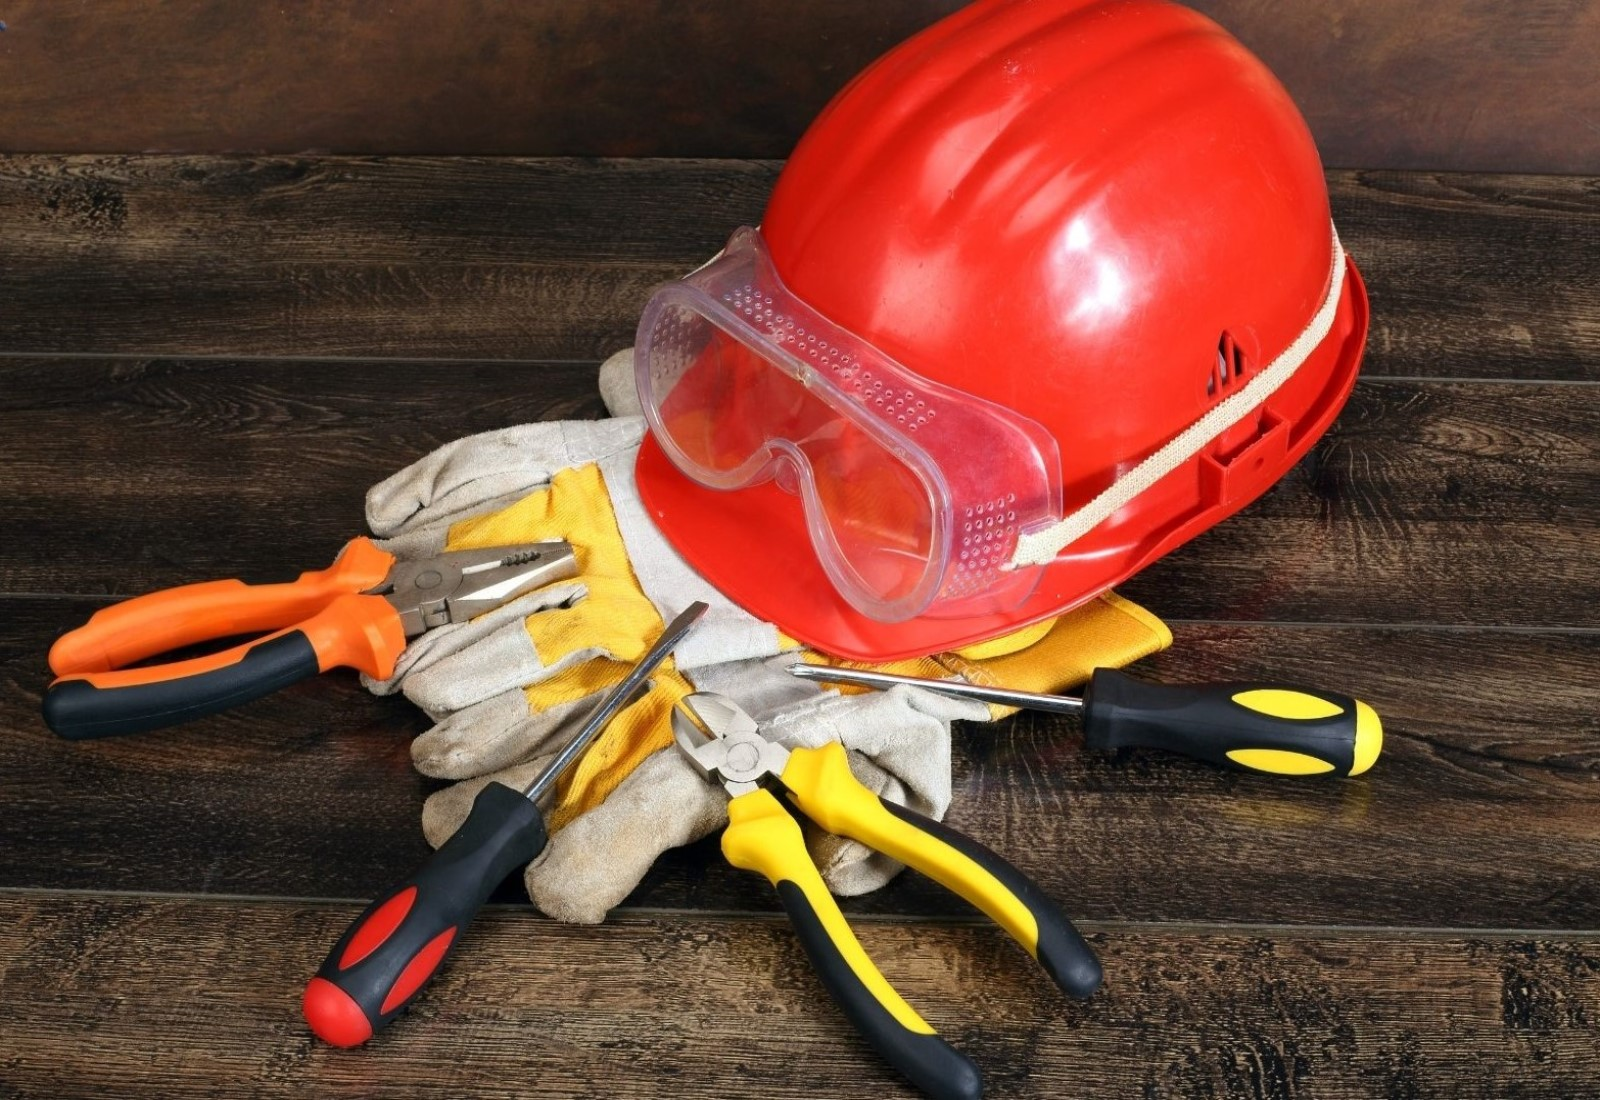 Commercial Handyman DIY repair small job building